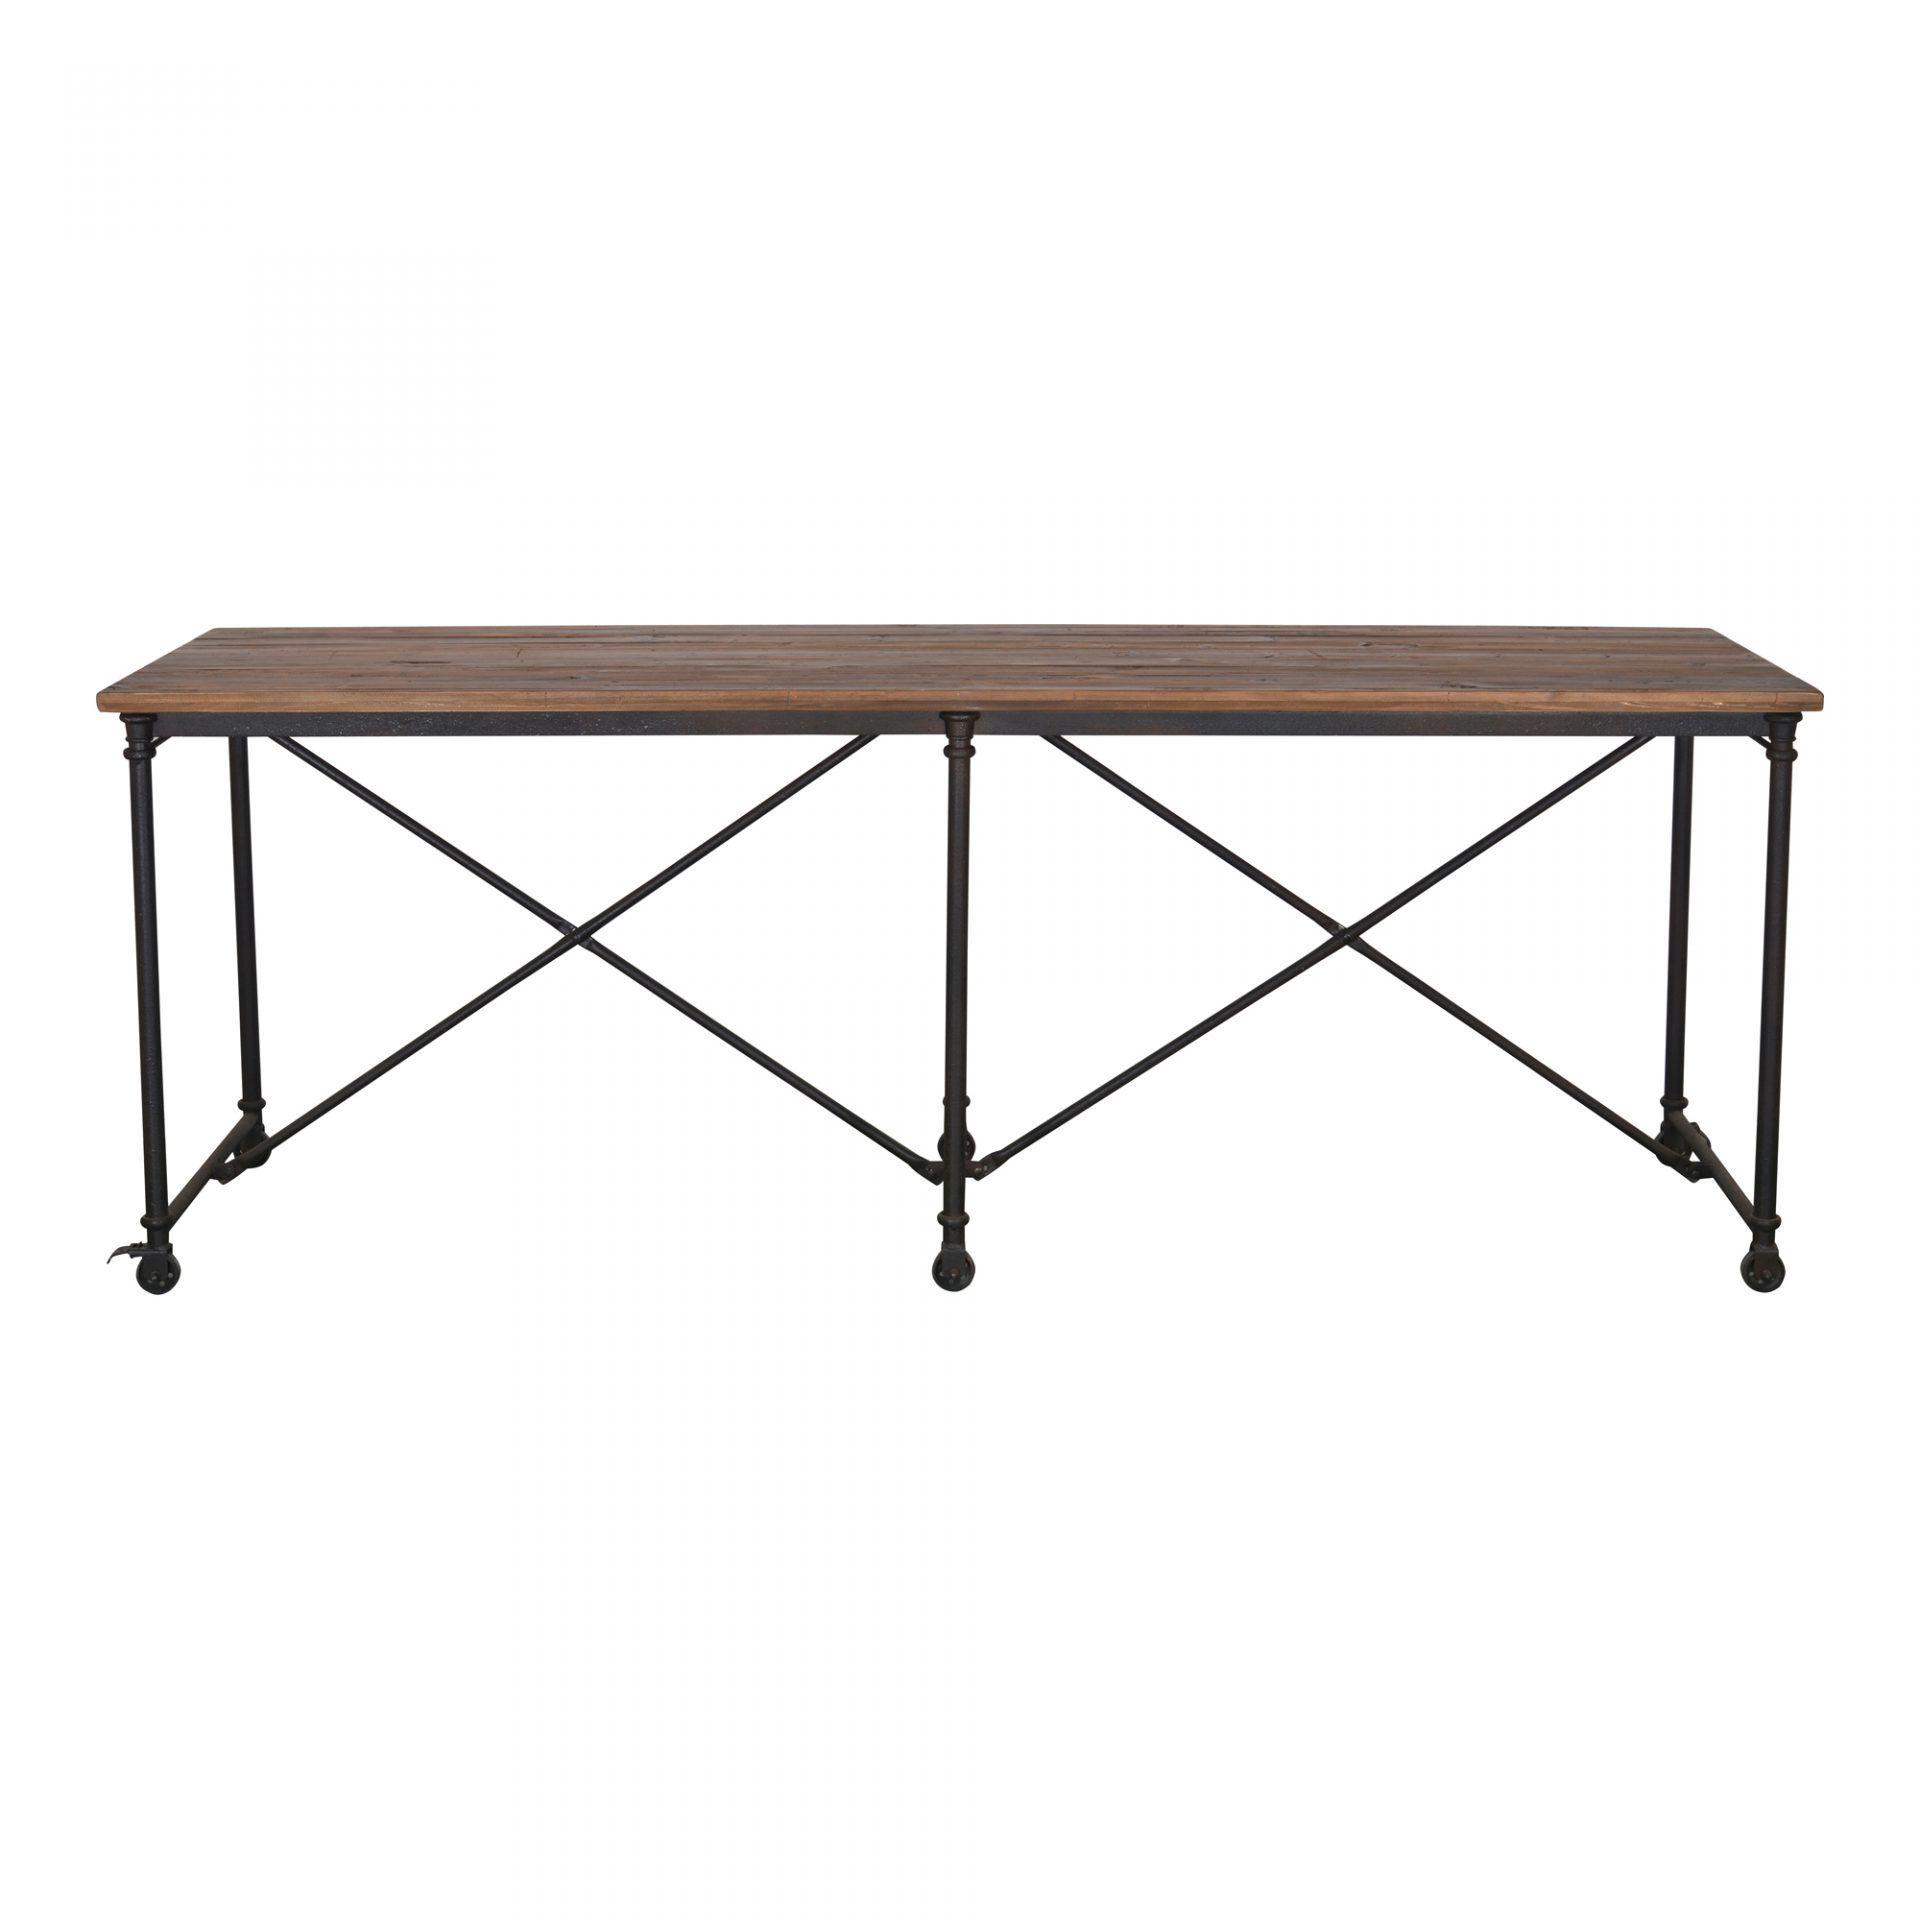 Tavern bar table bar counter tables moes wholesale patio bar set